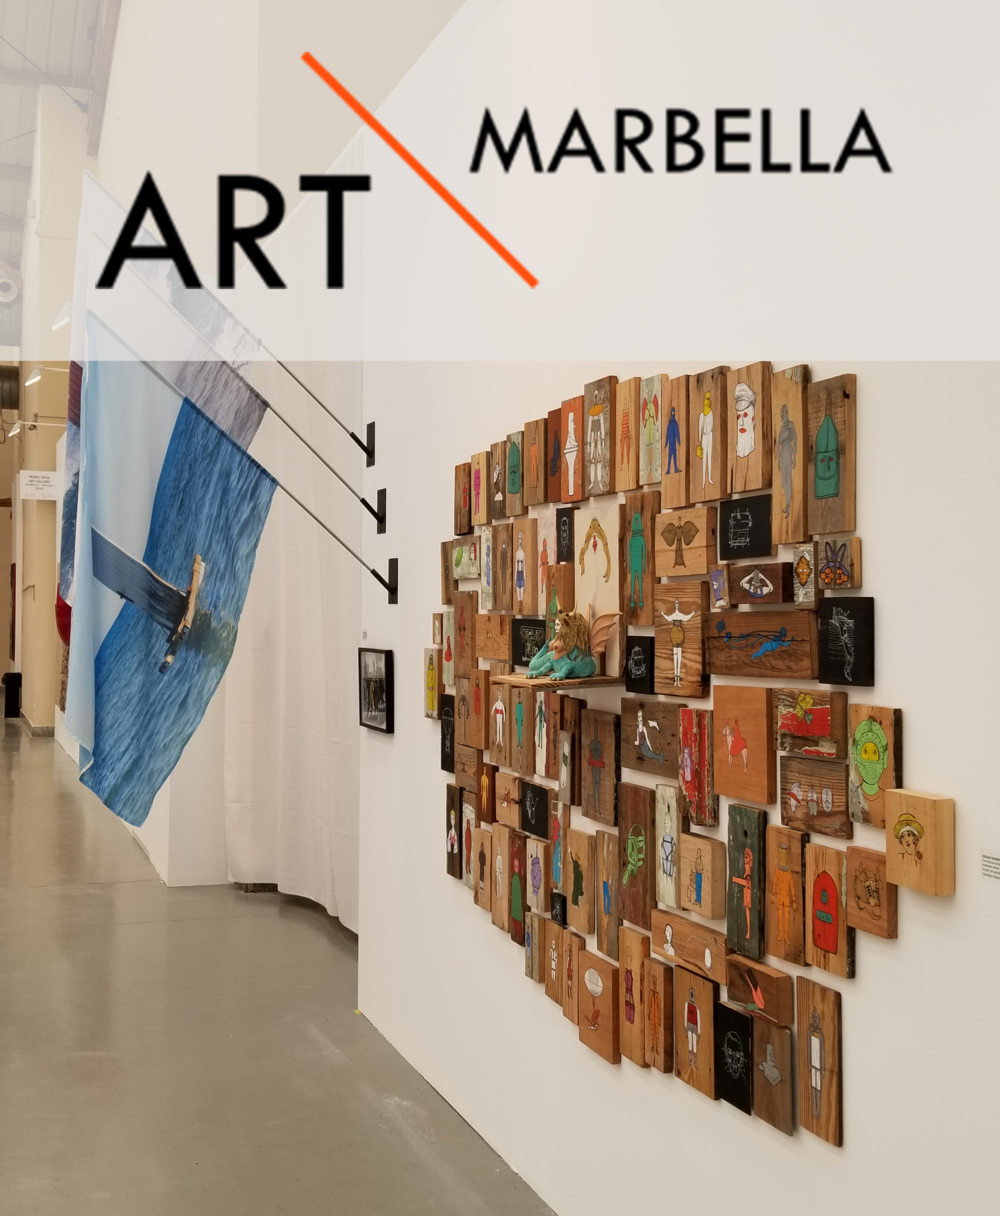 Marbella, Spain, July 21/25, 2018